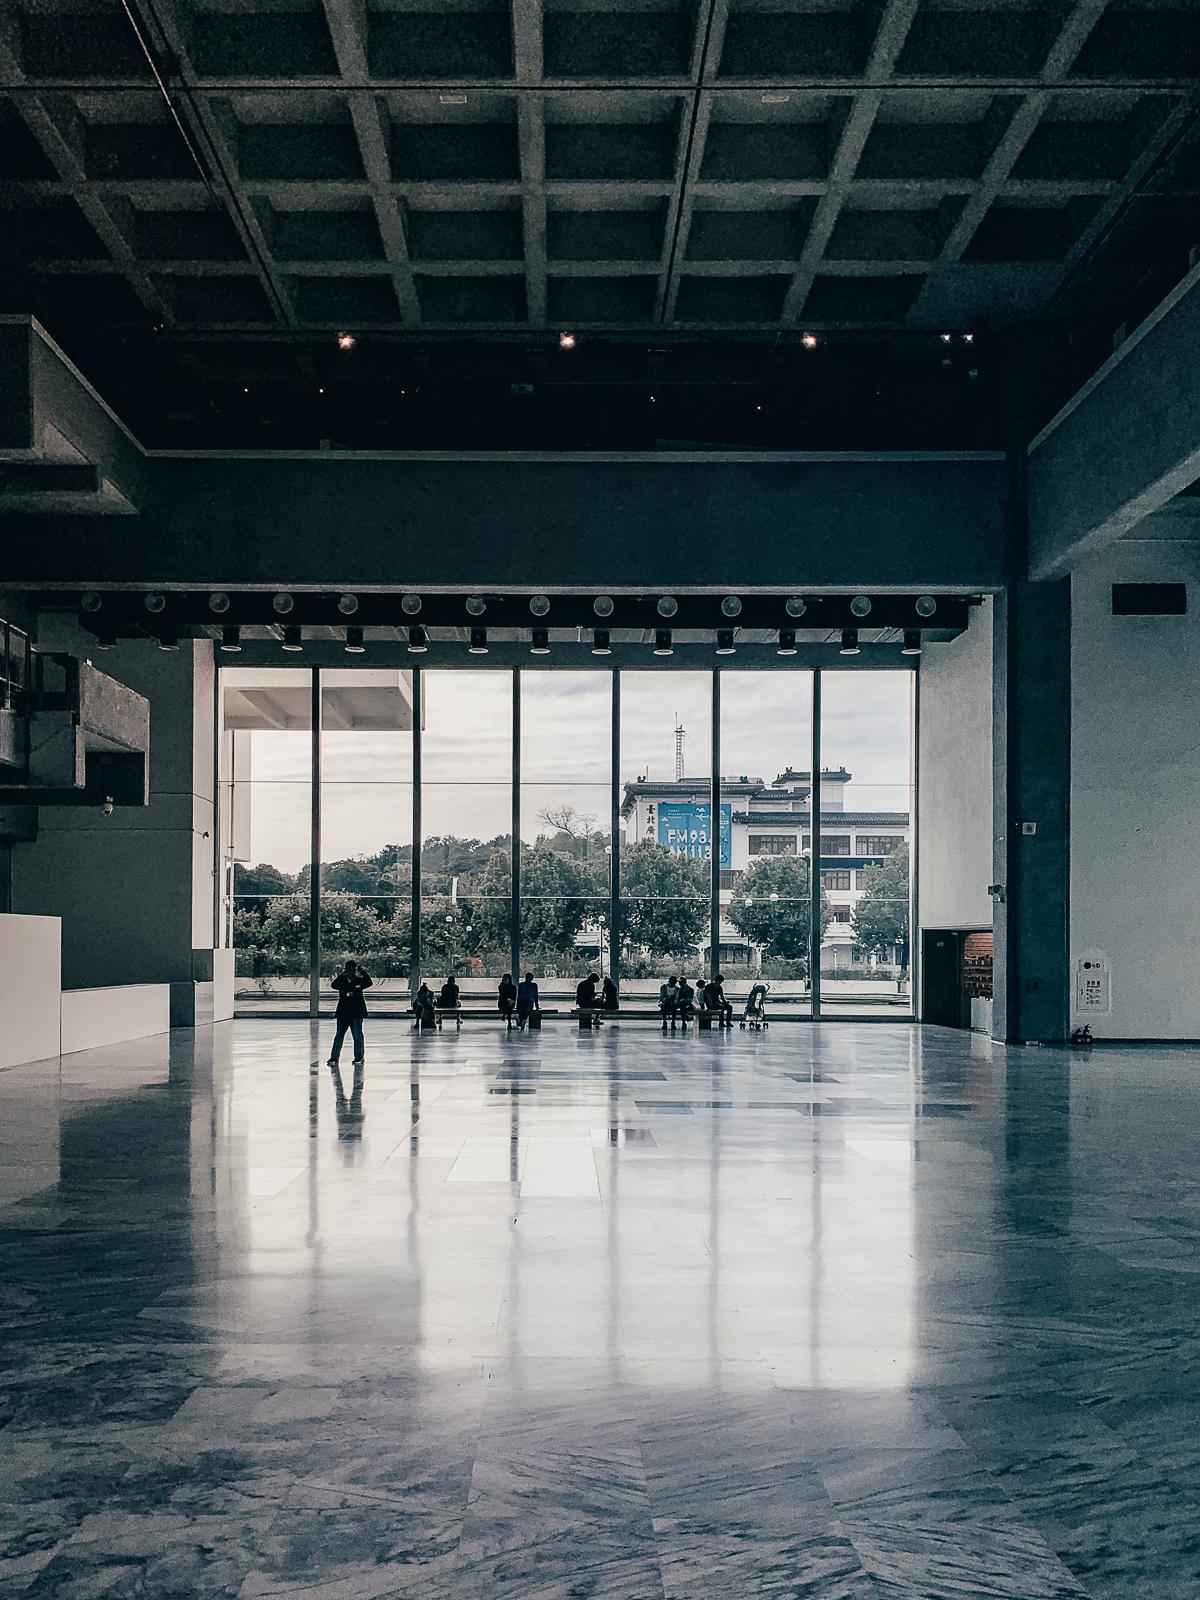 Taipei Fine Arts Museum Architecture Photography Workshop - iPhoneX - Yes! Please Enjoy by Fanning Tseng-2.jpg